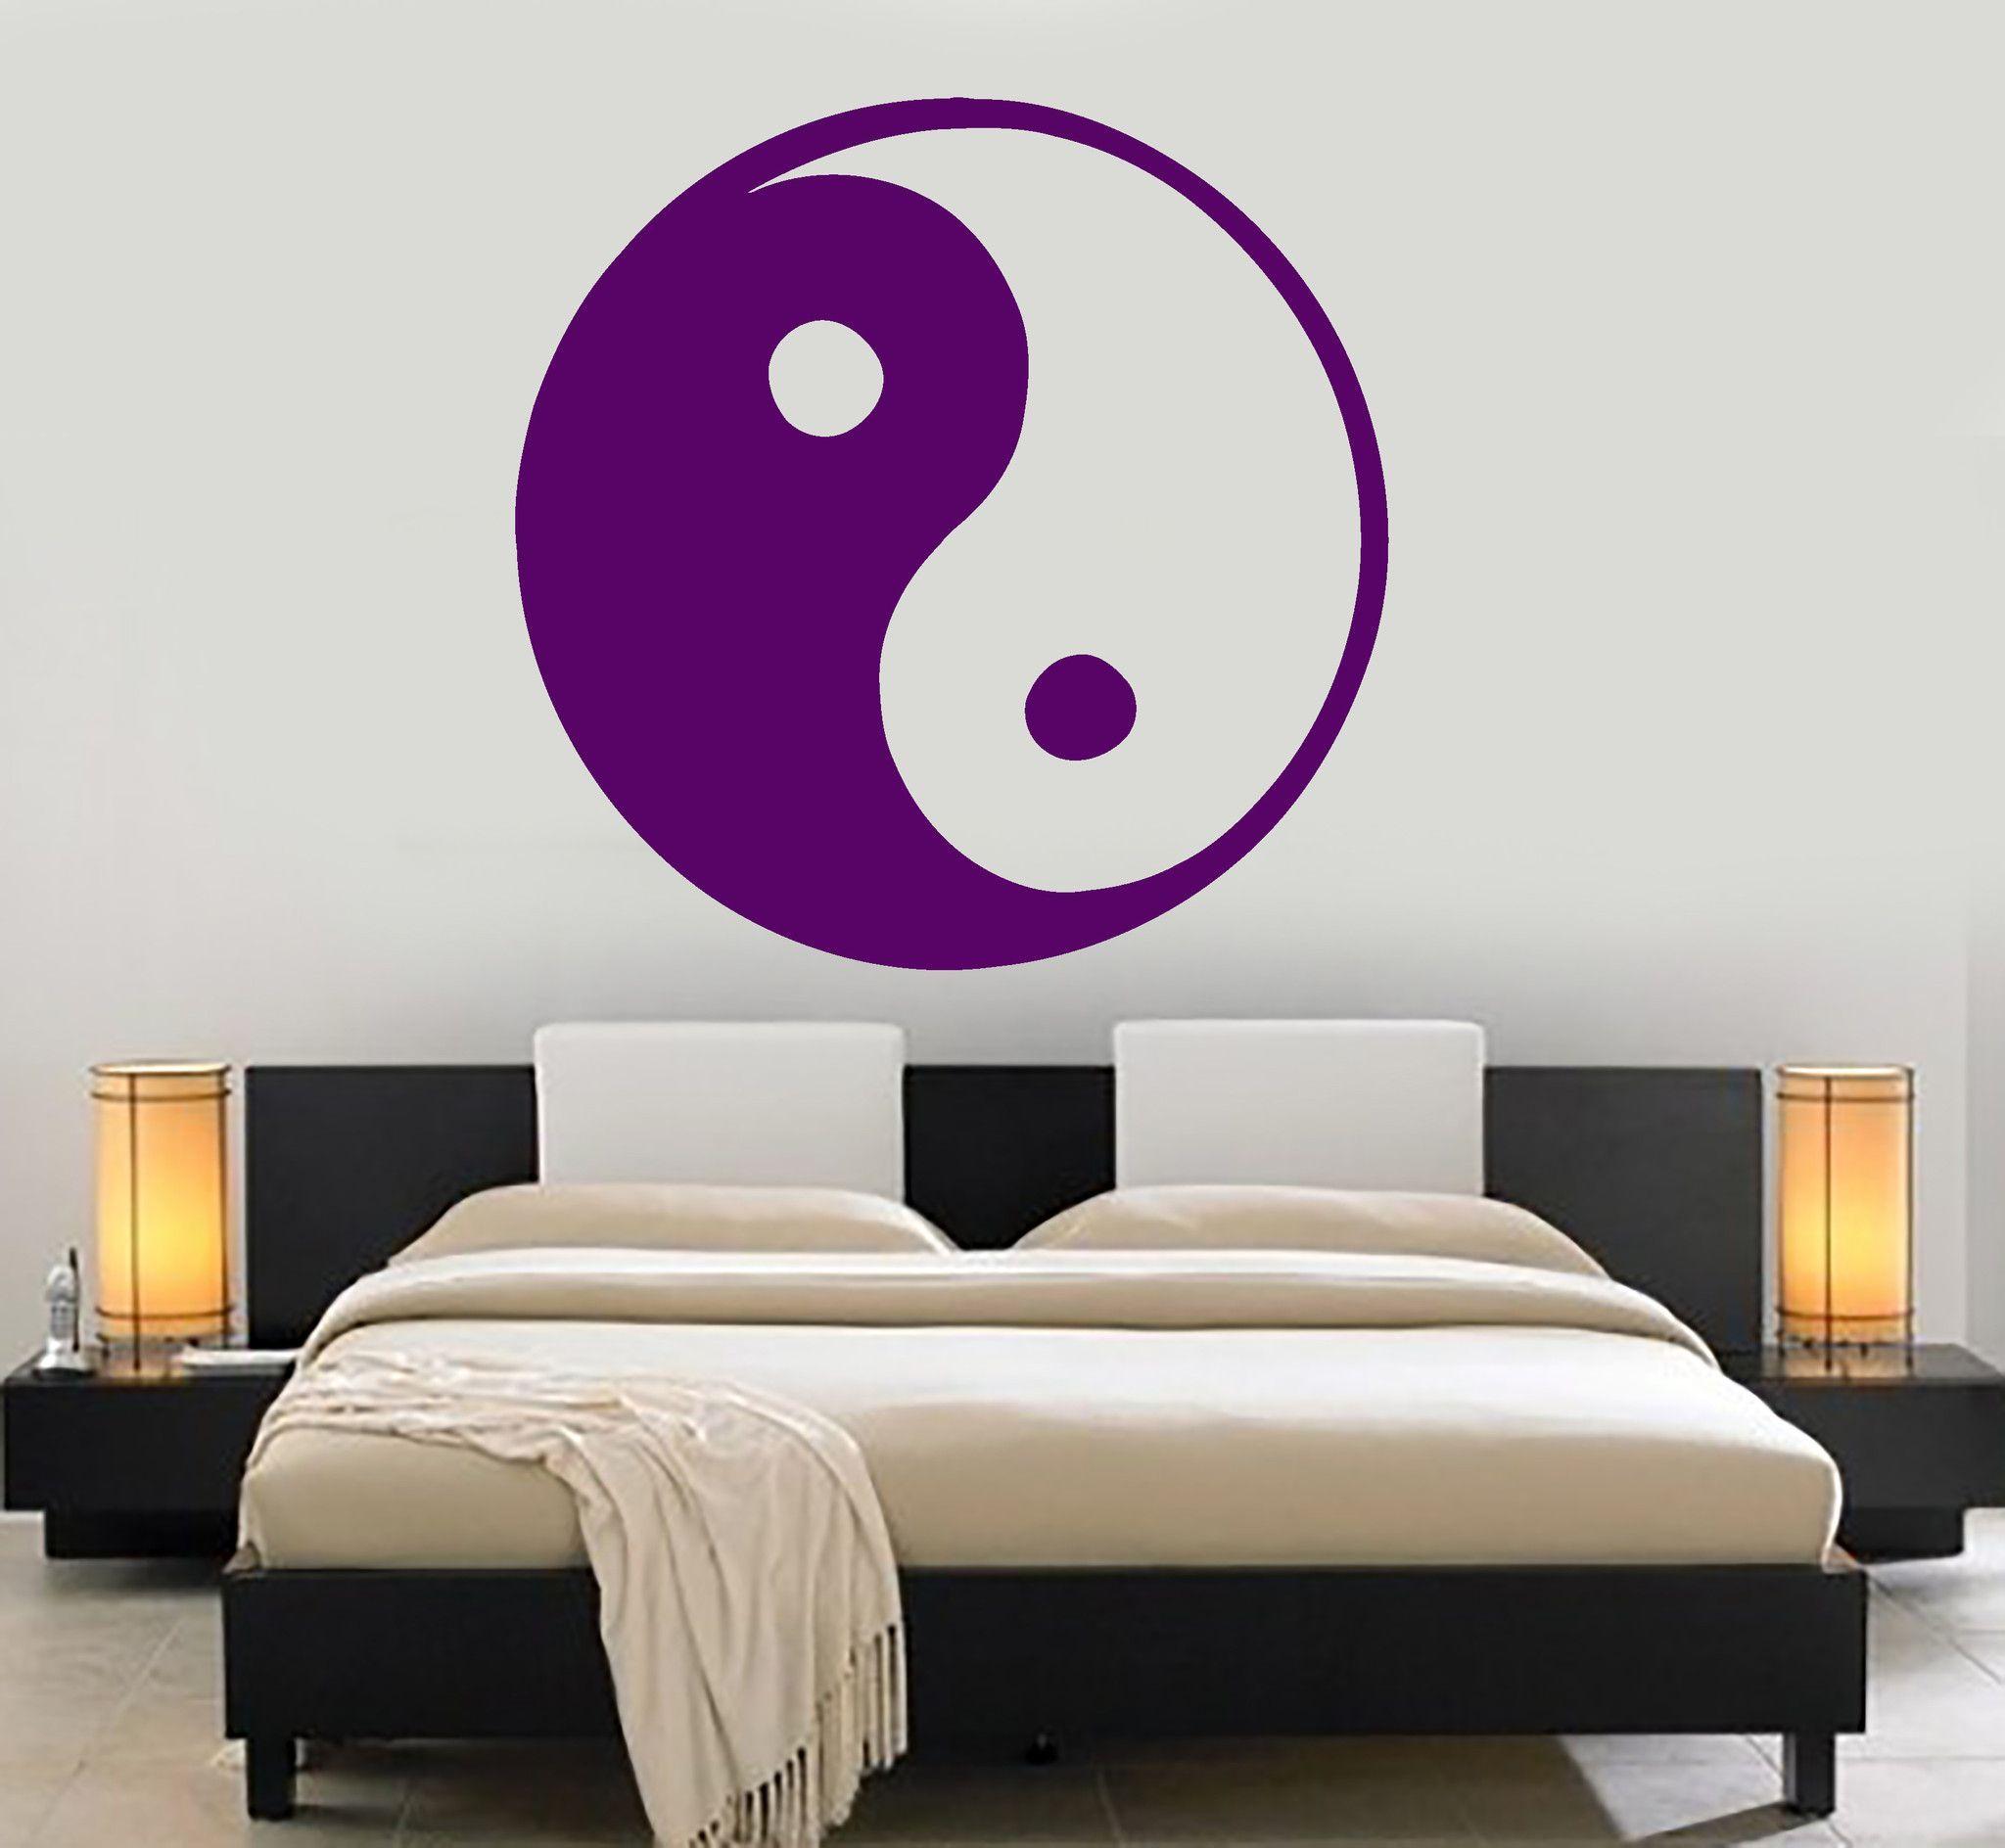 Vinyl Wall Decal Yin Yang Symbol Asian Decor Room Design Stickers - Vinyl wall decals asian